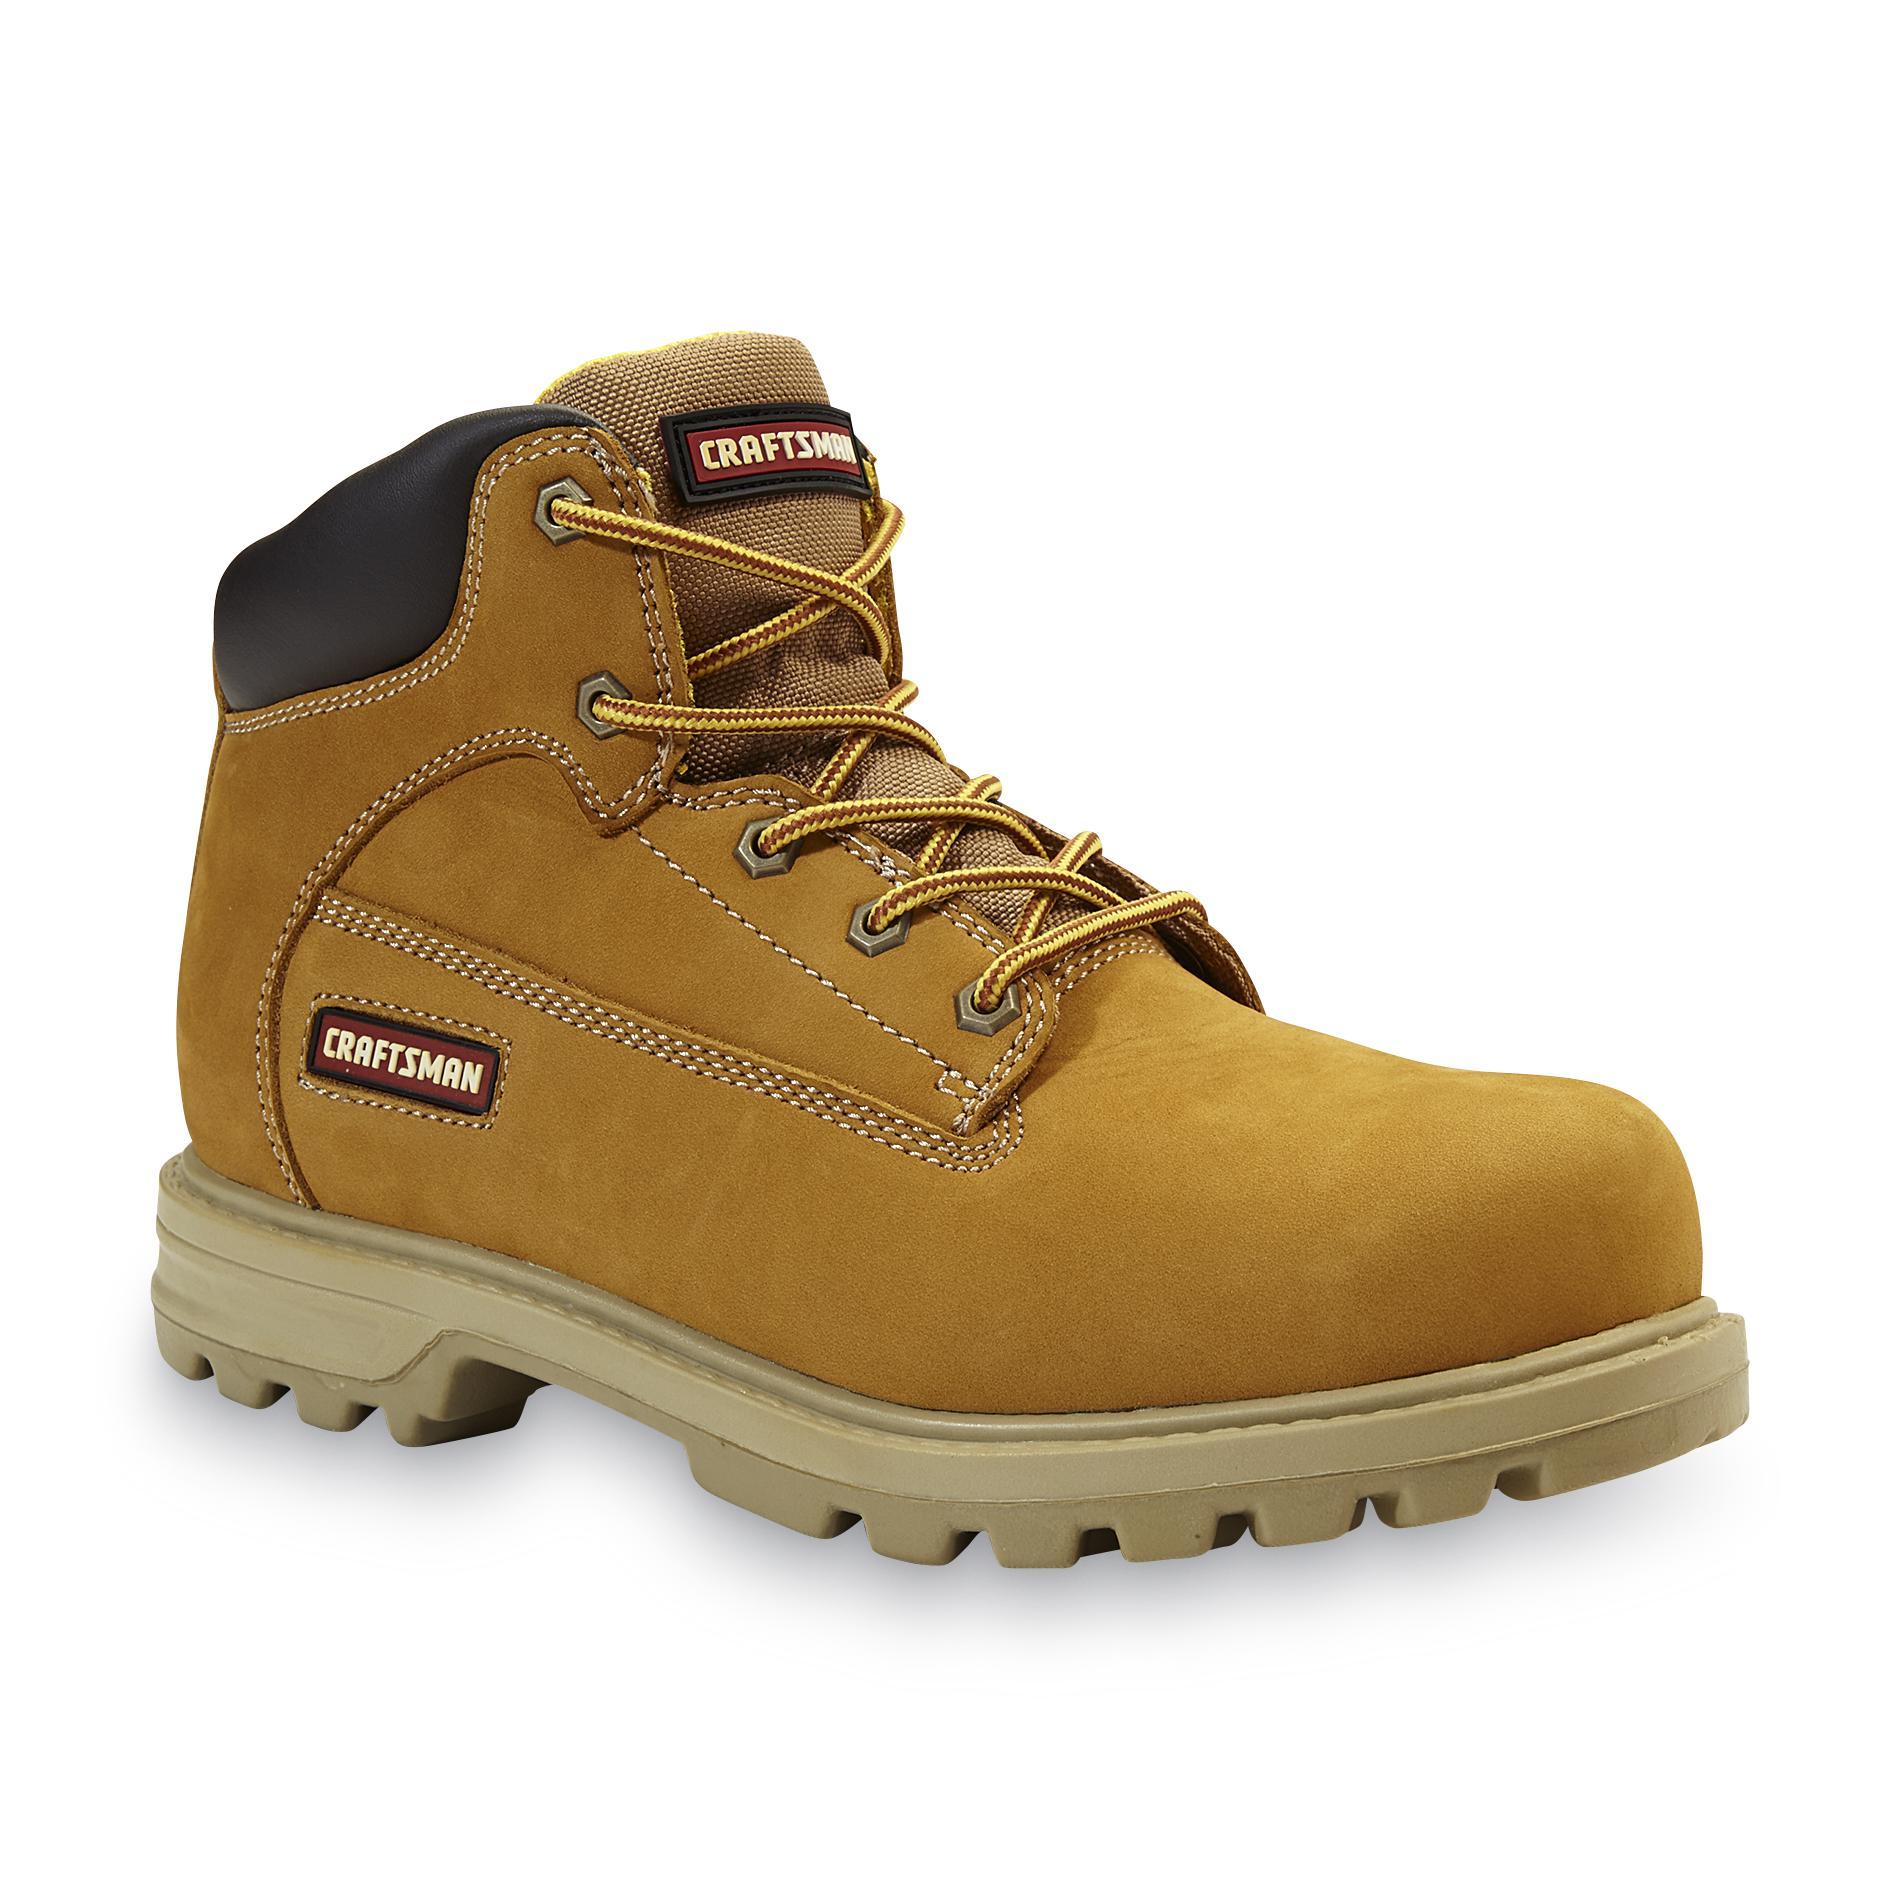 Craftsman Men's Kujo Tan Leather Work Boot